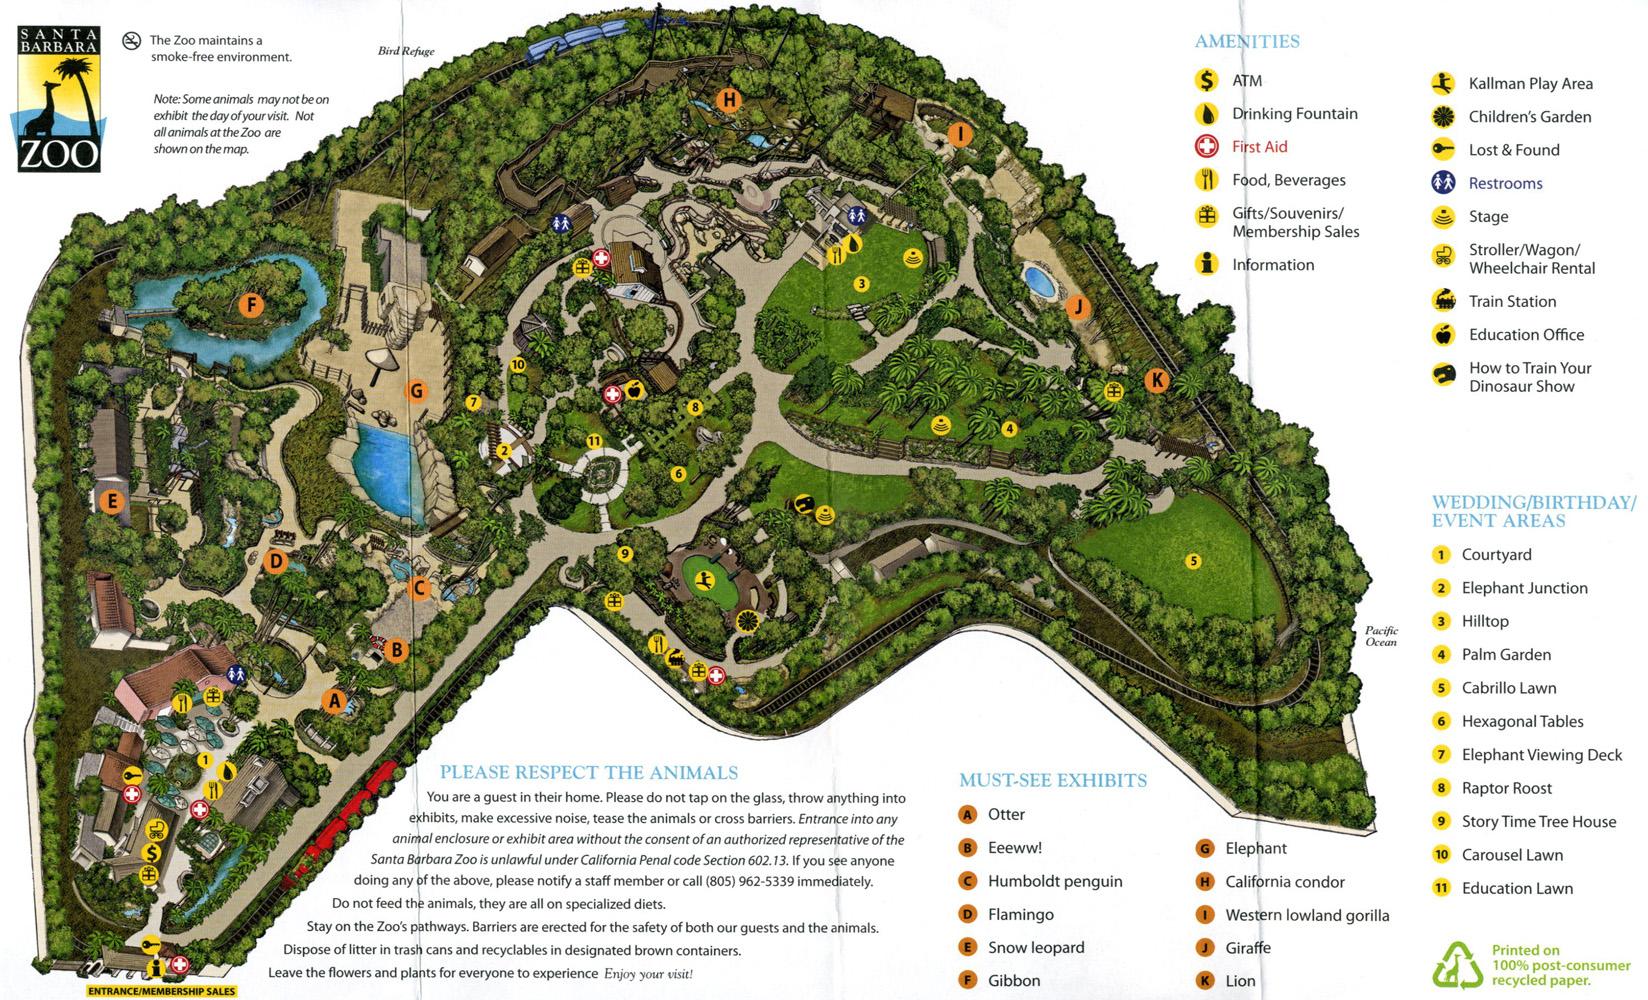 Santa Barbara Zoo Map Best Image Konpax 2018